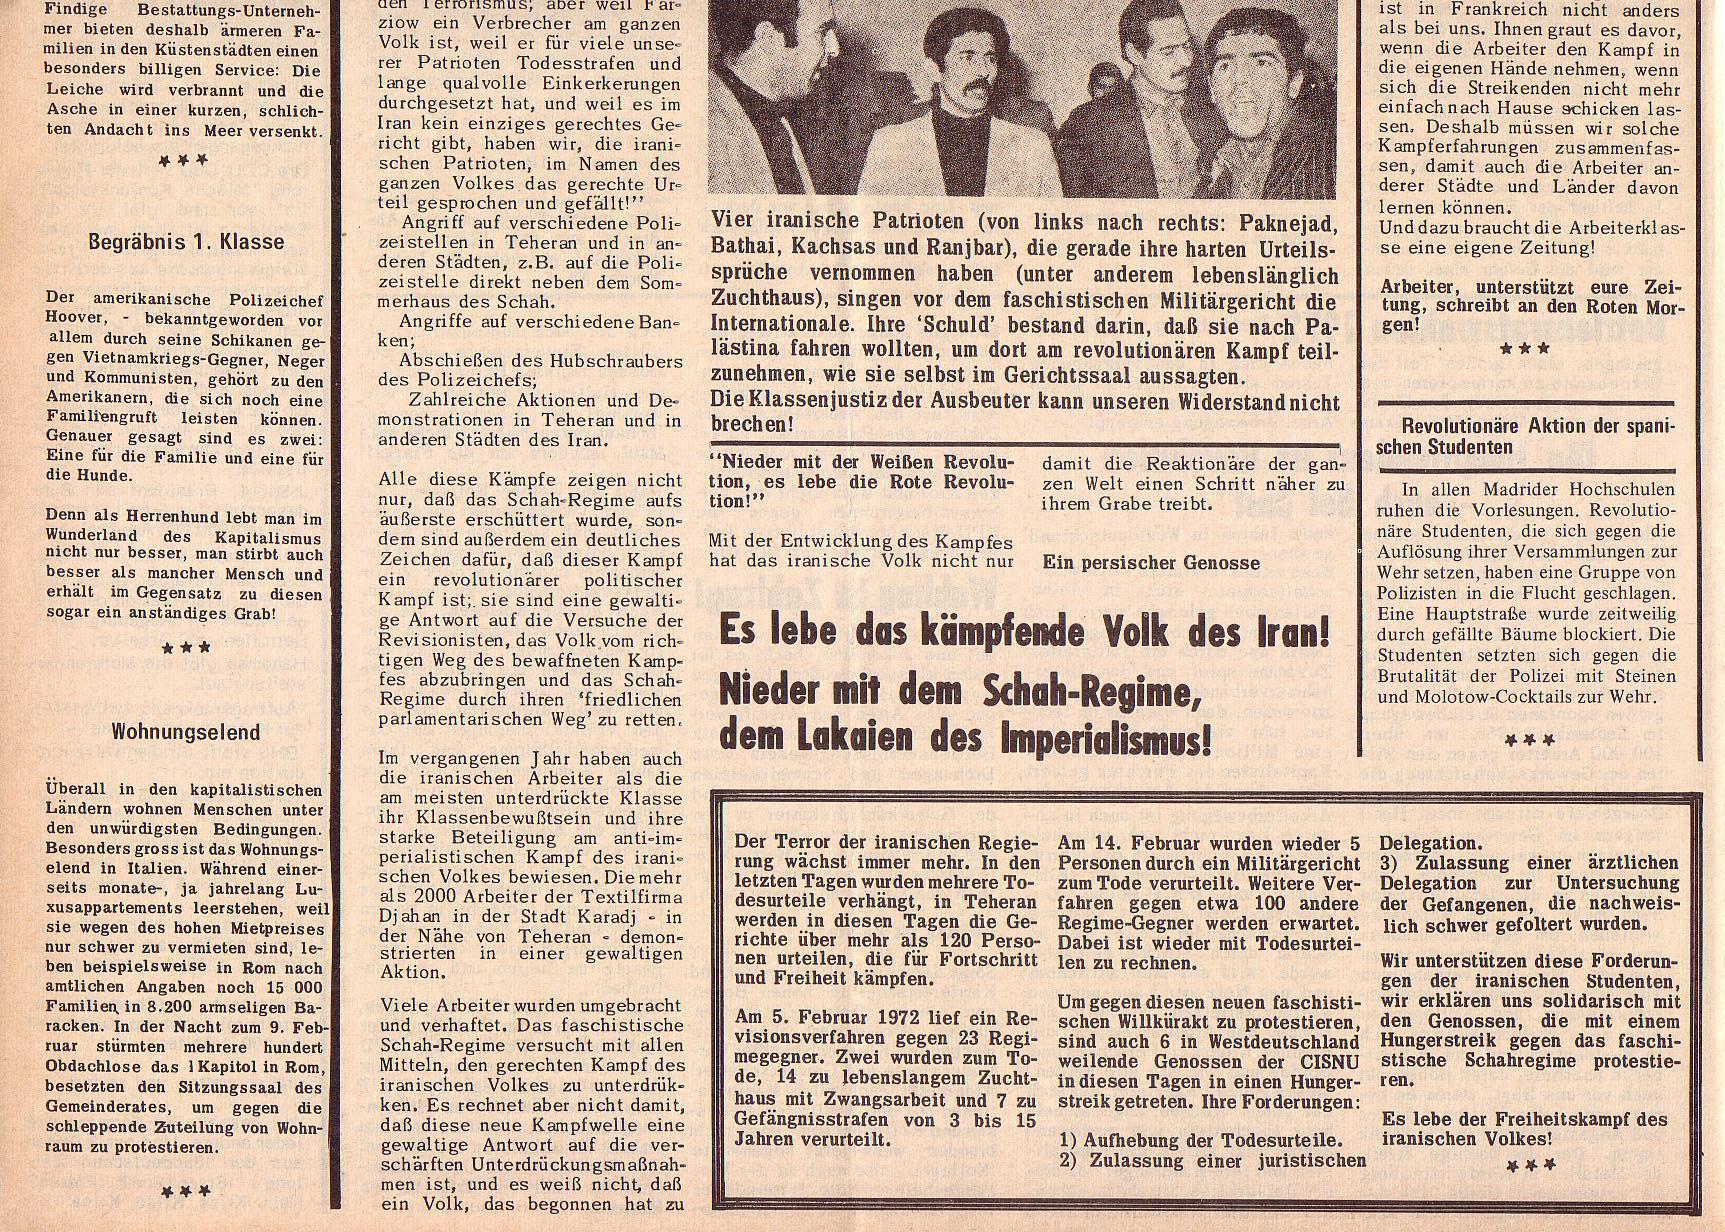 Roter Morgen, 6. Jg., 28. Februar 1972, Nr. 5, Seite 4b